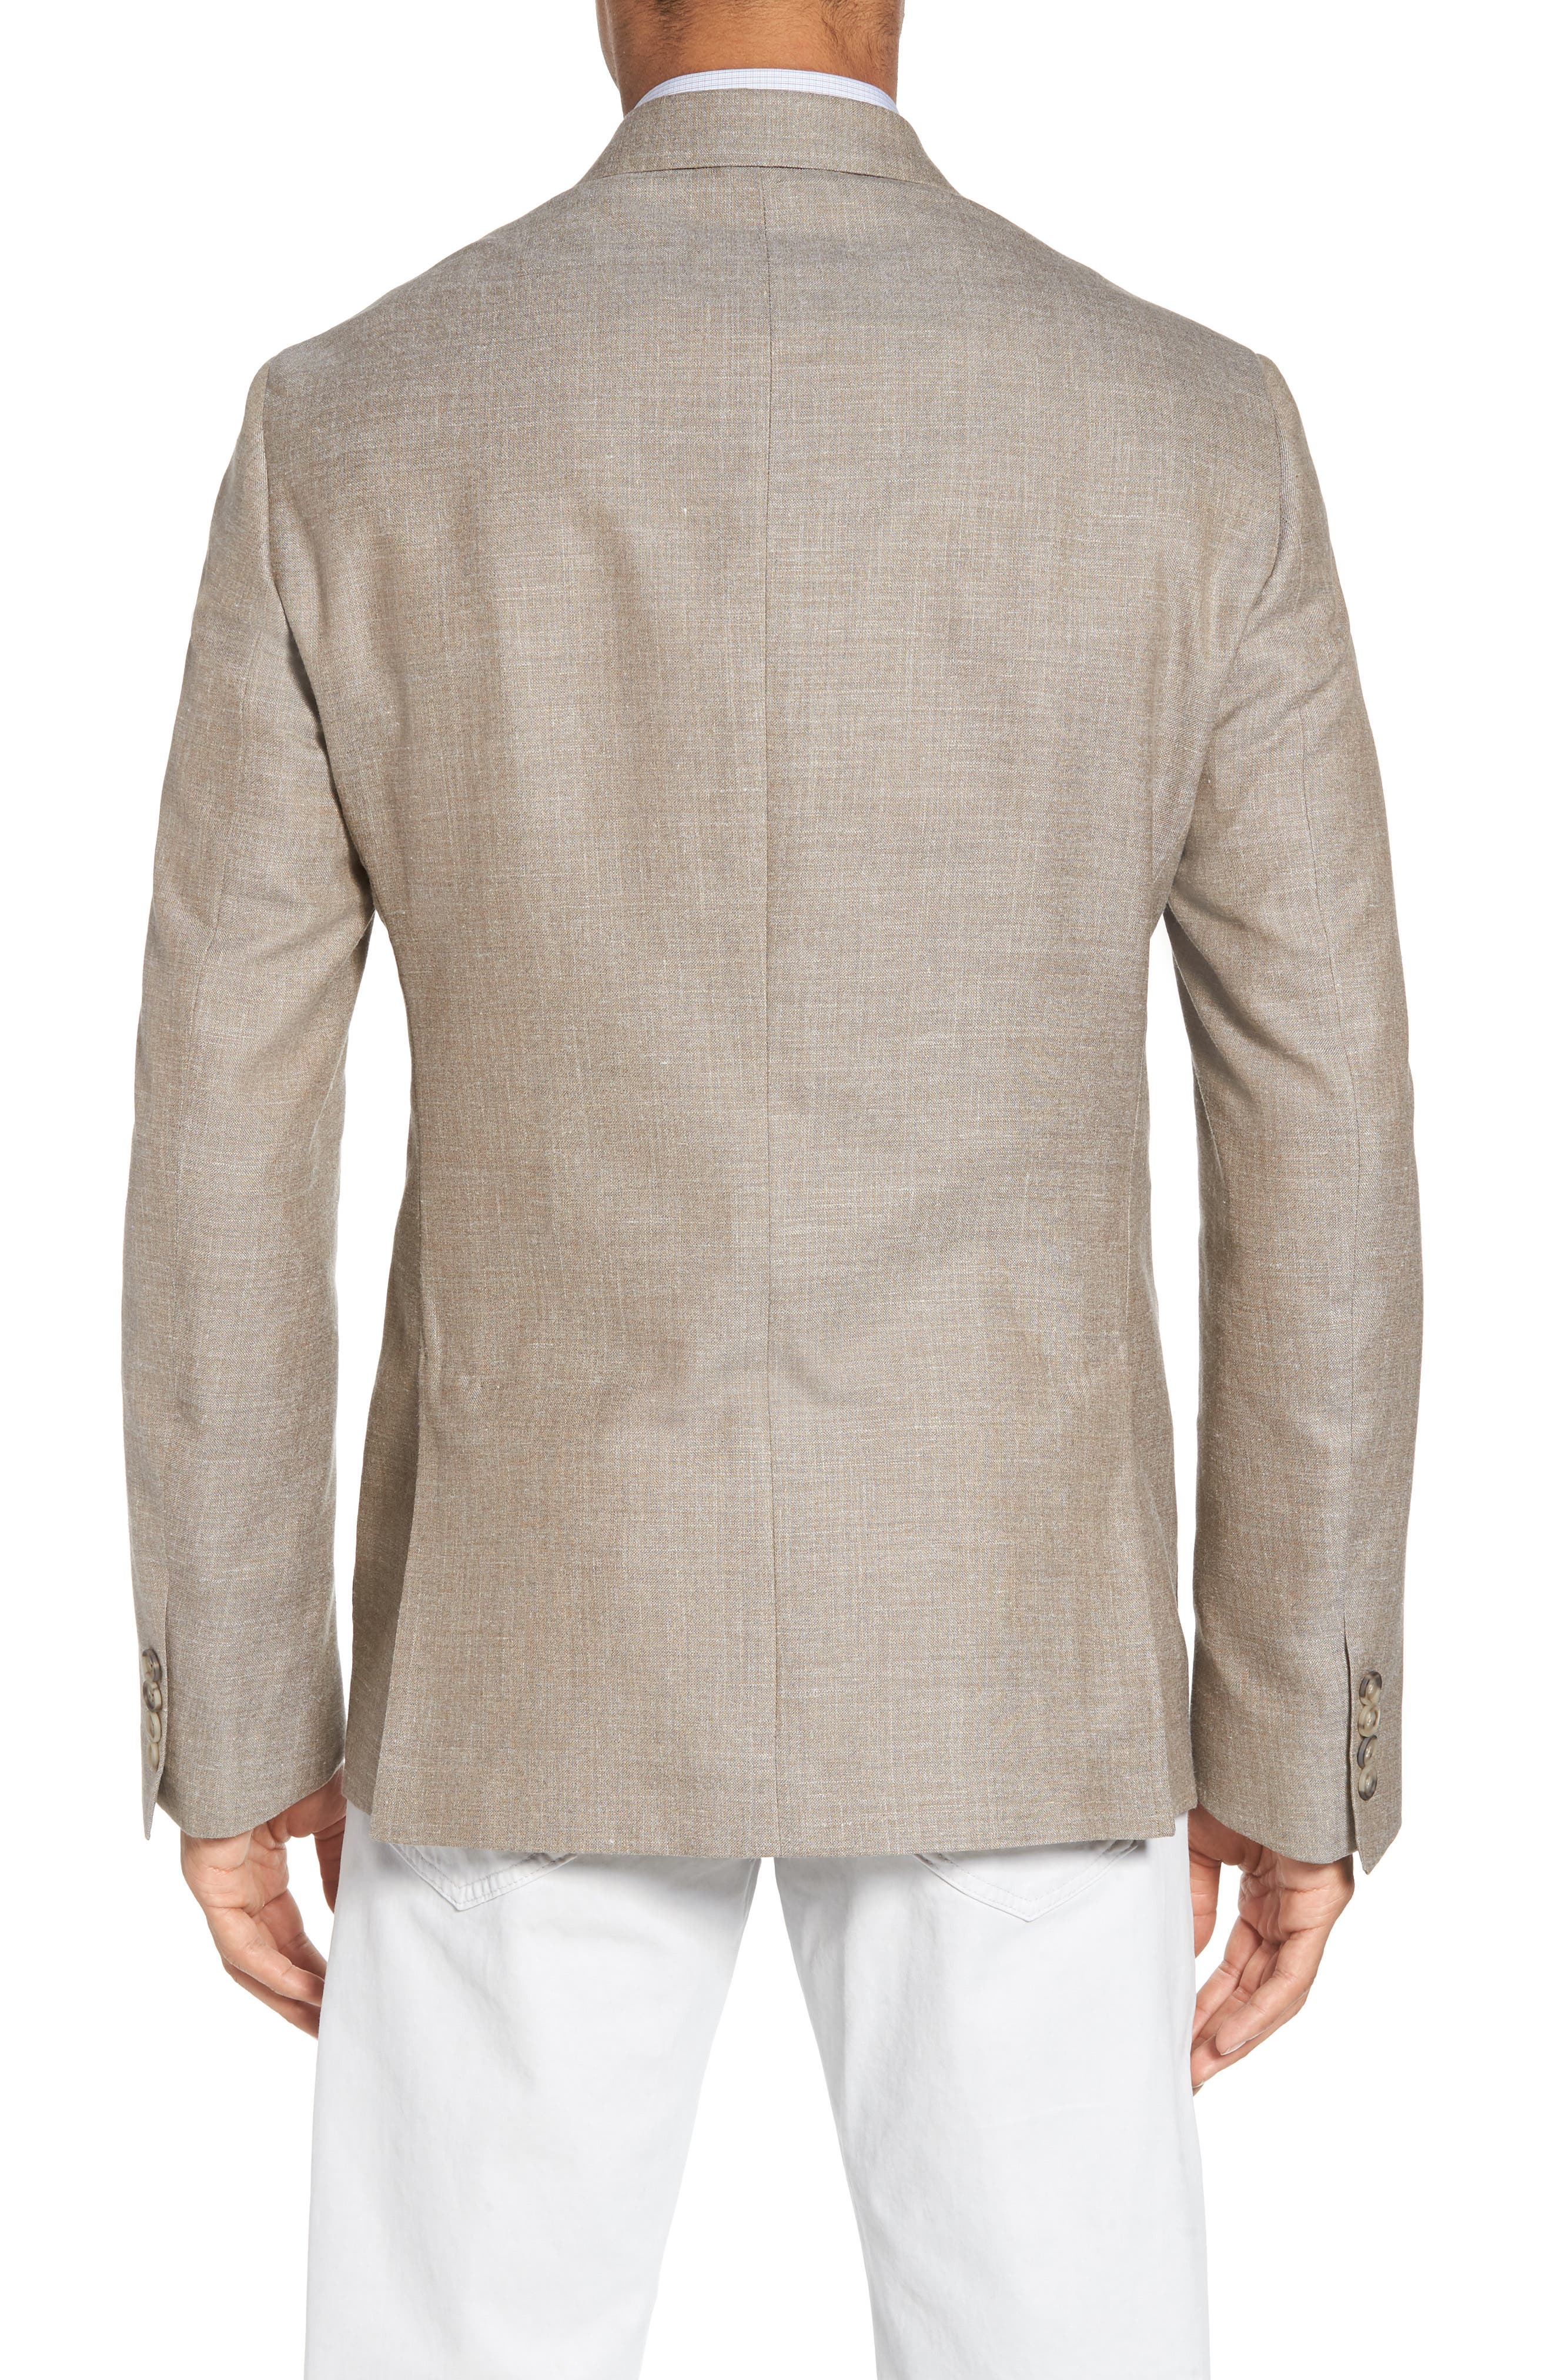 Trim Fit Wool Blend Blazer,                             Alternate thumbnail 2, color,                             Tan